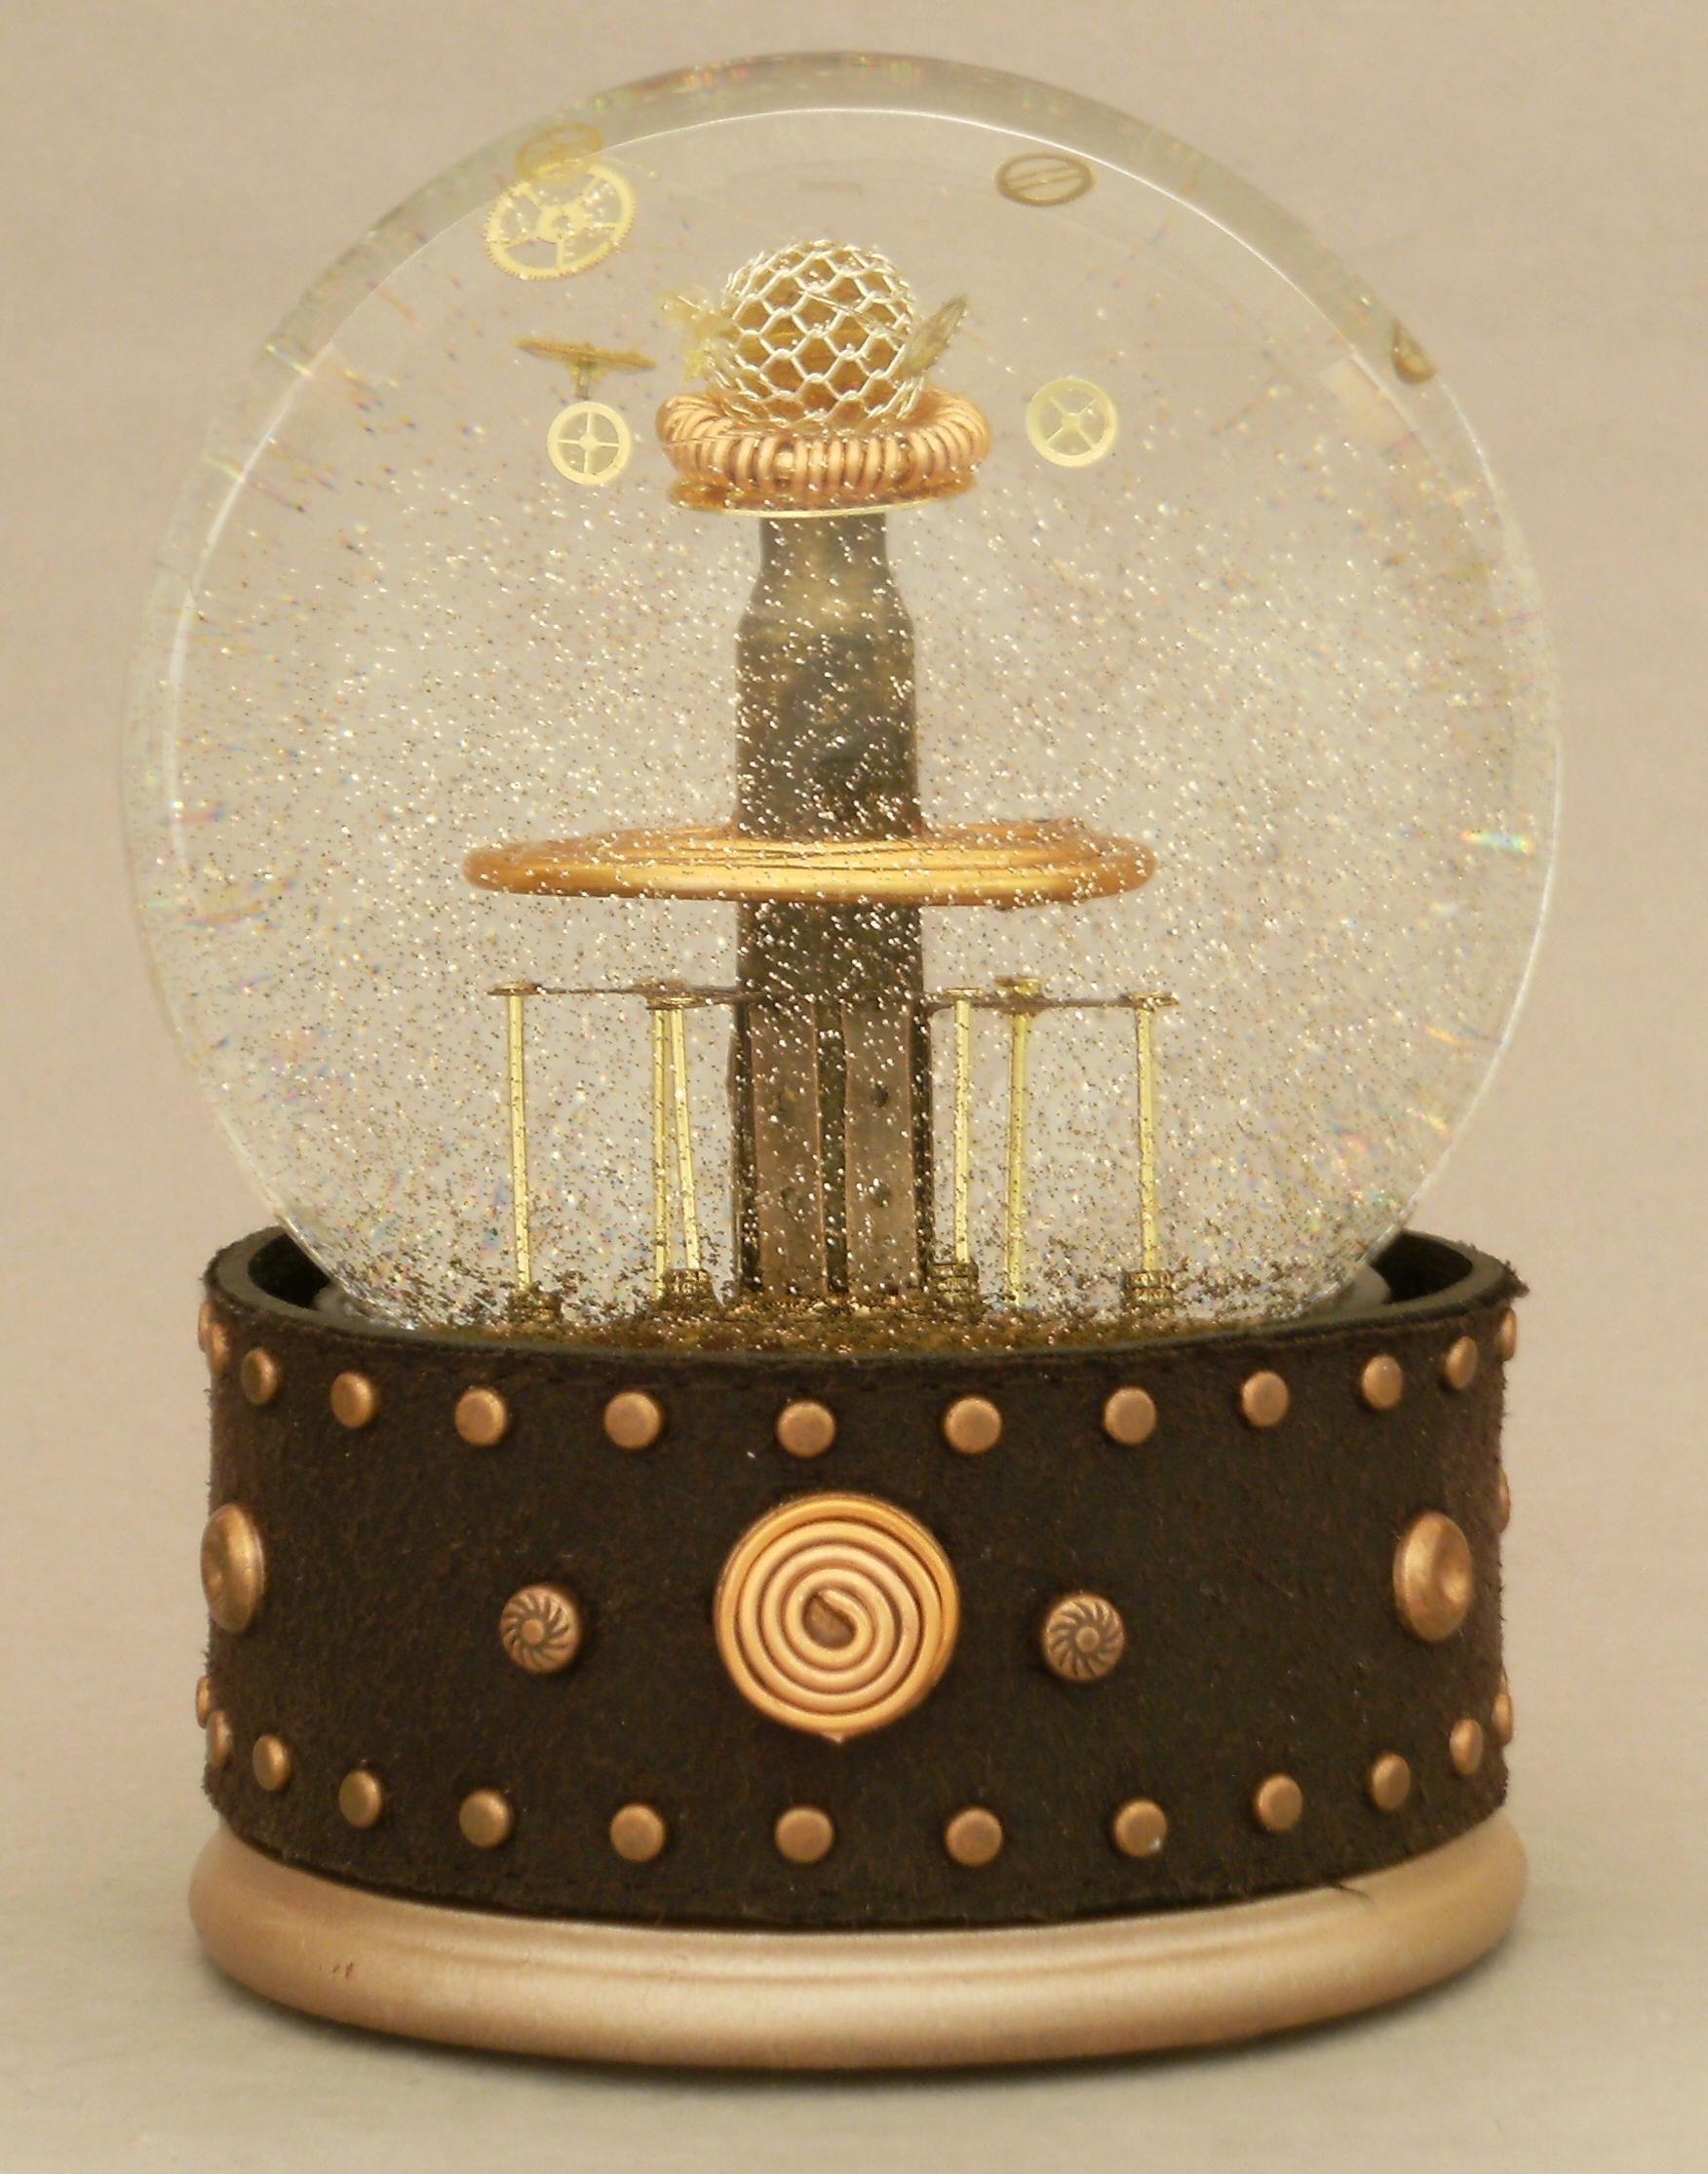 Tesla Copper Coil by Camryn Forrest Designs | Steampunk ...